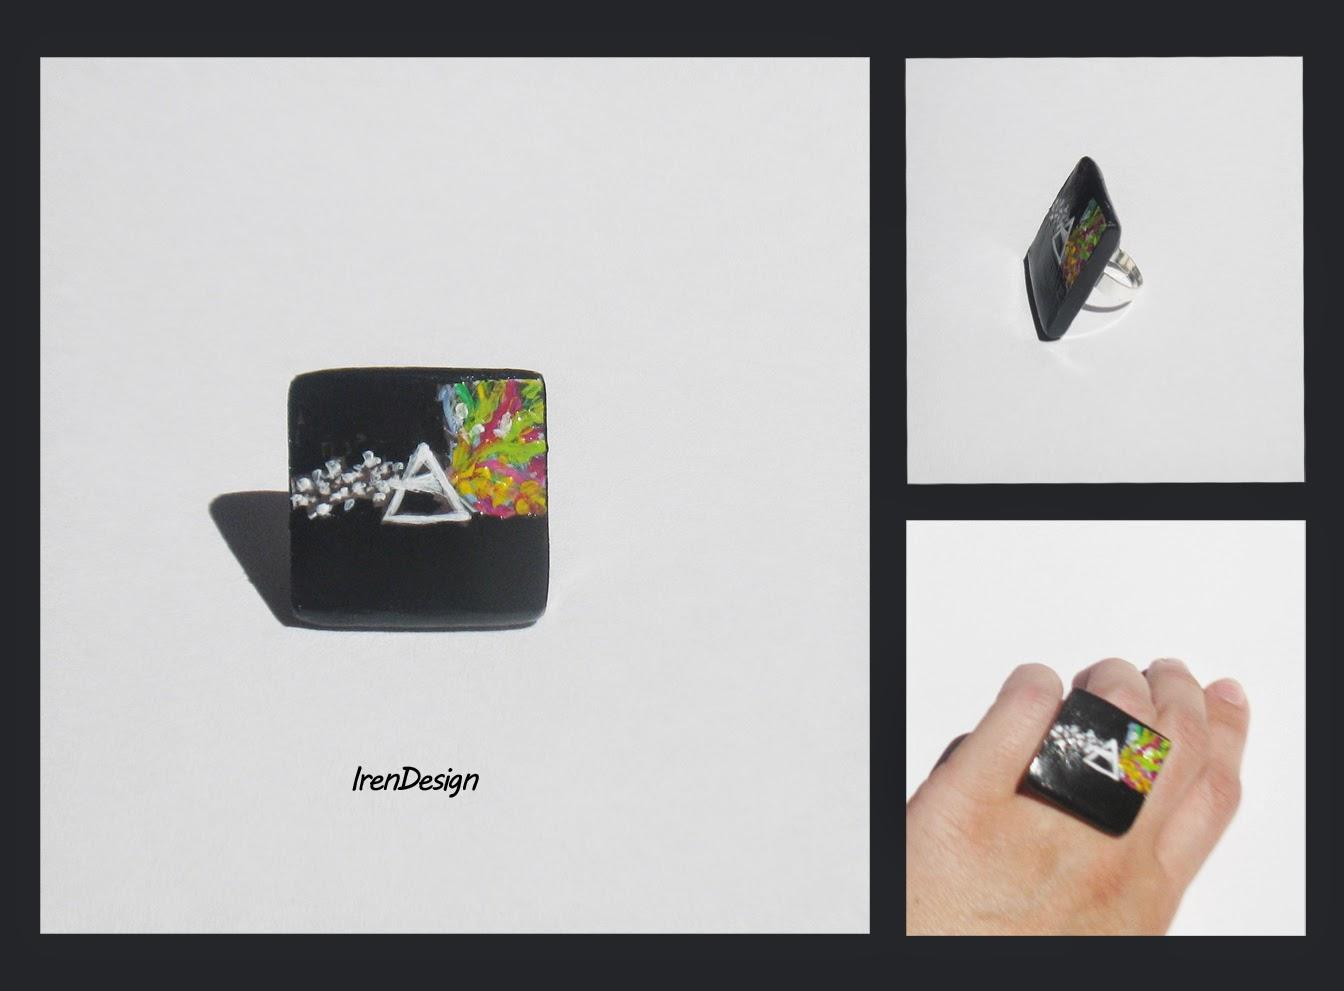 ring handmade by irendesign